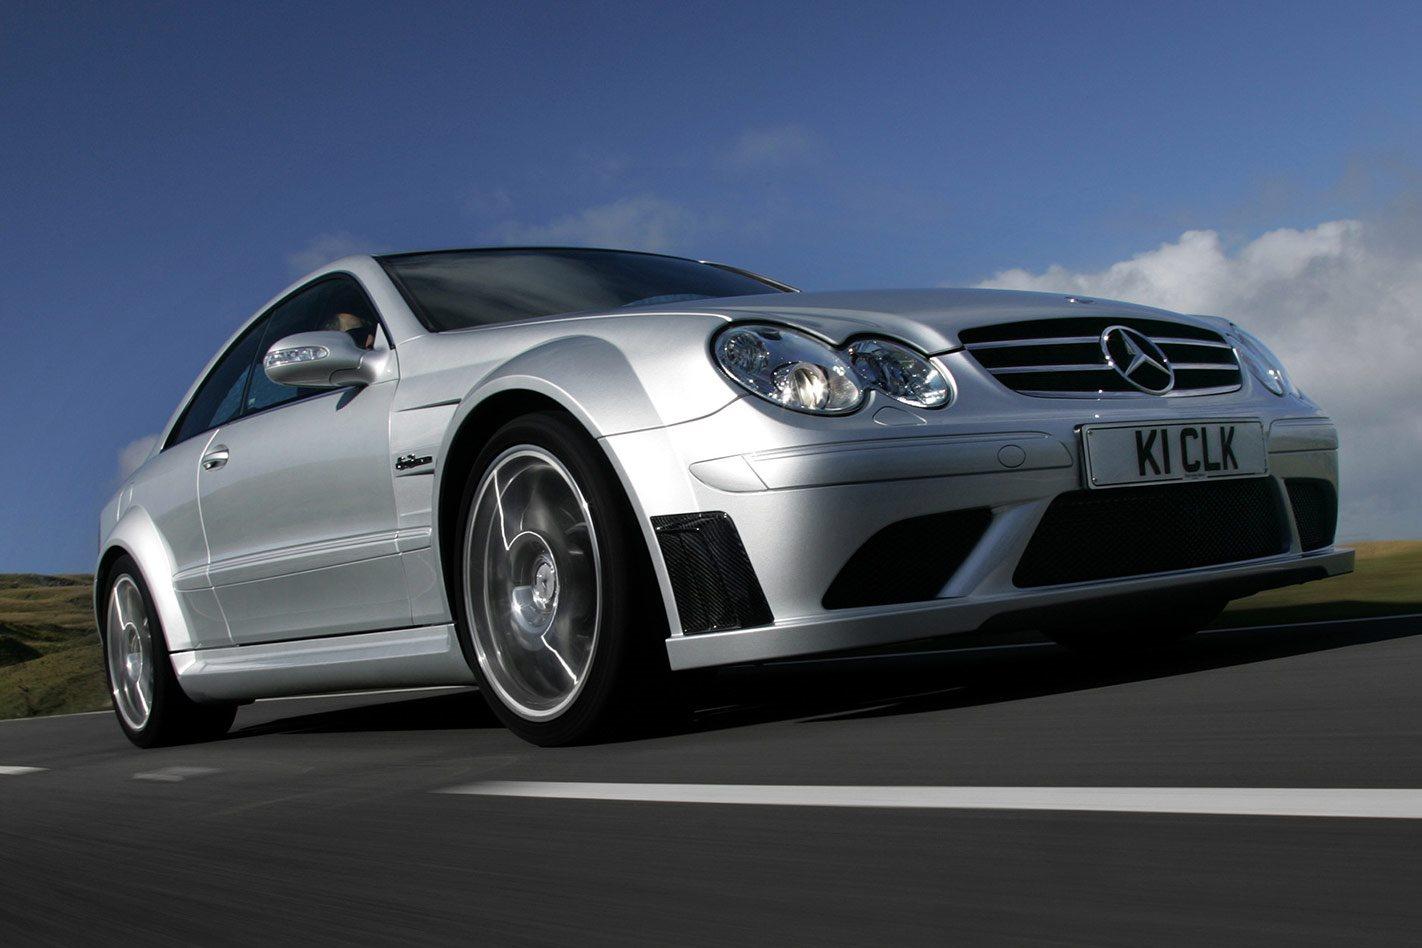 Mercedes-Benz AMG CLK 63 Black series